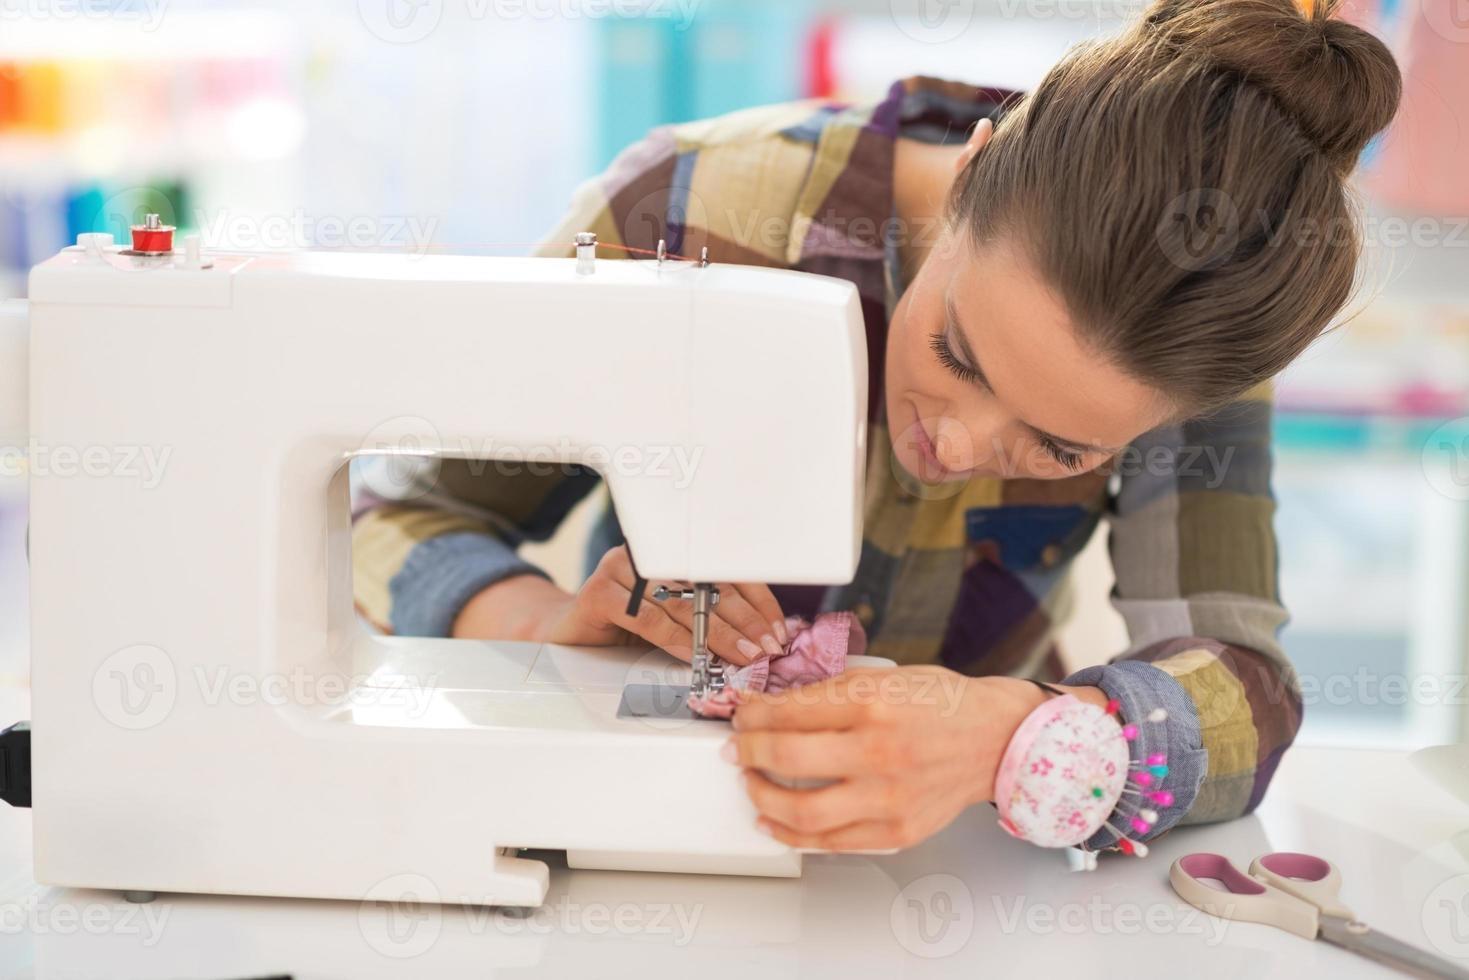 Costurera cosiendo en studio foto